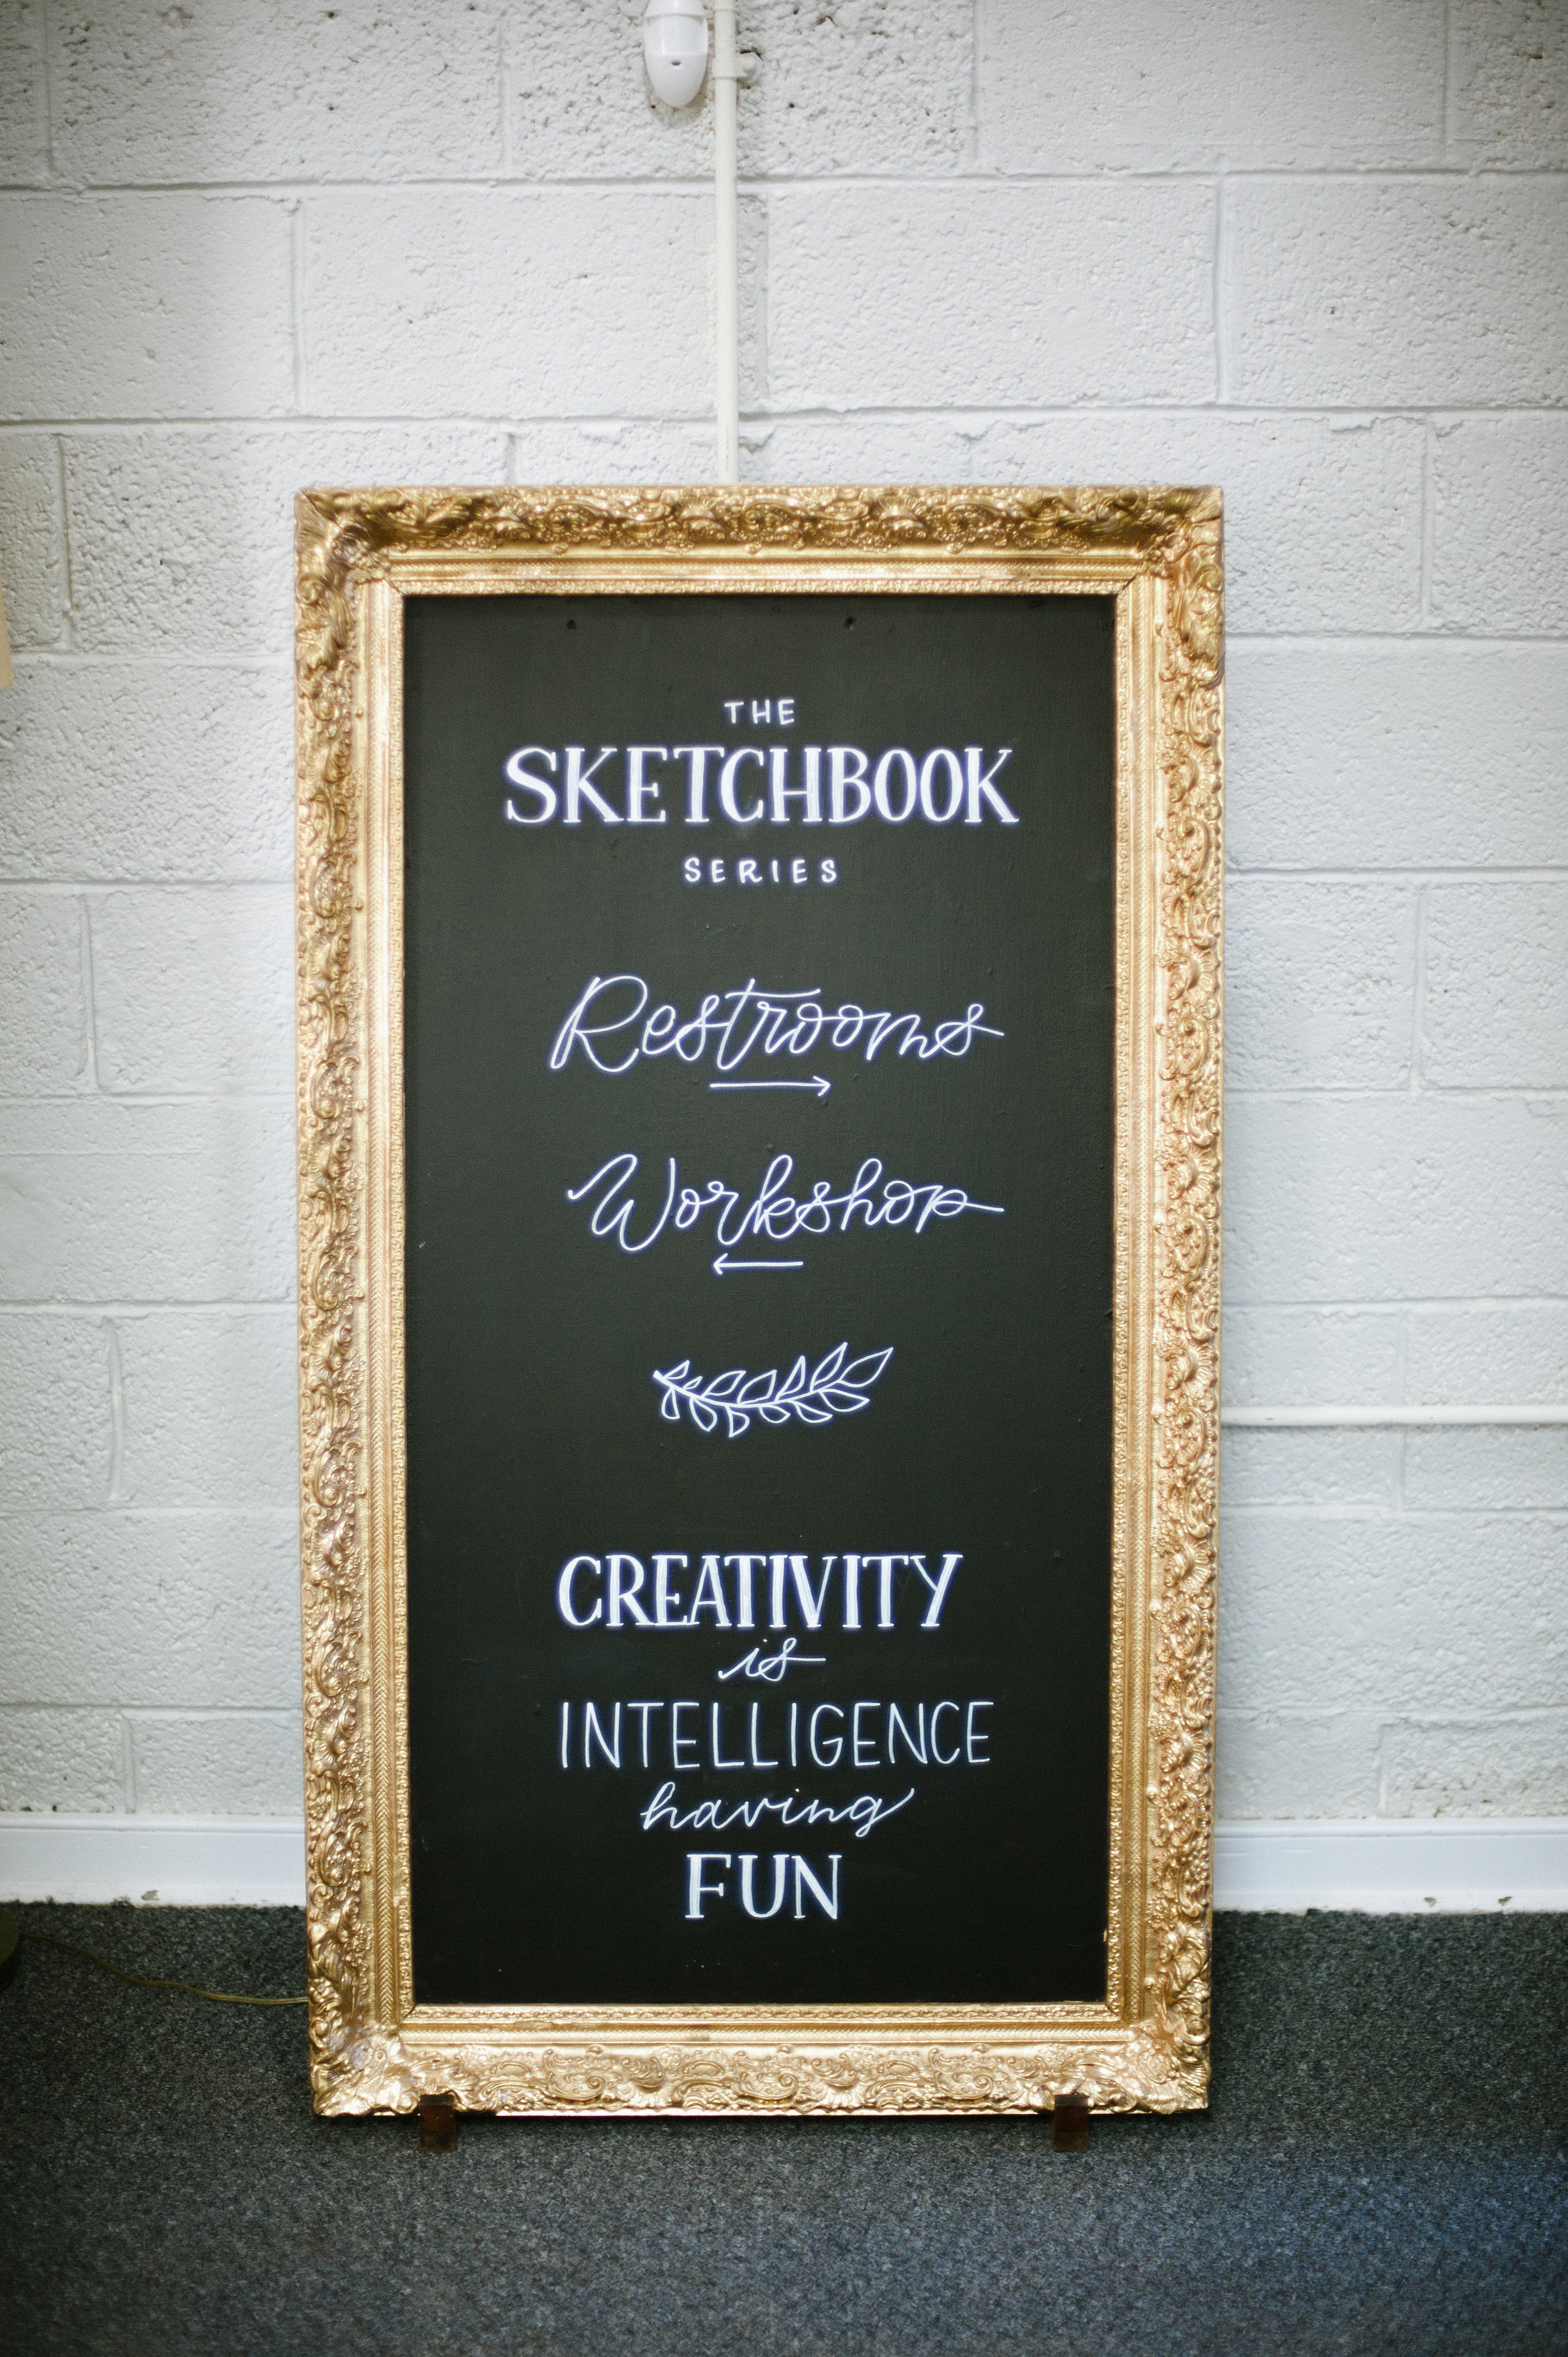 SketchbookSeriesRichmond-27.jpg